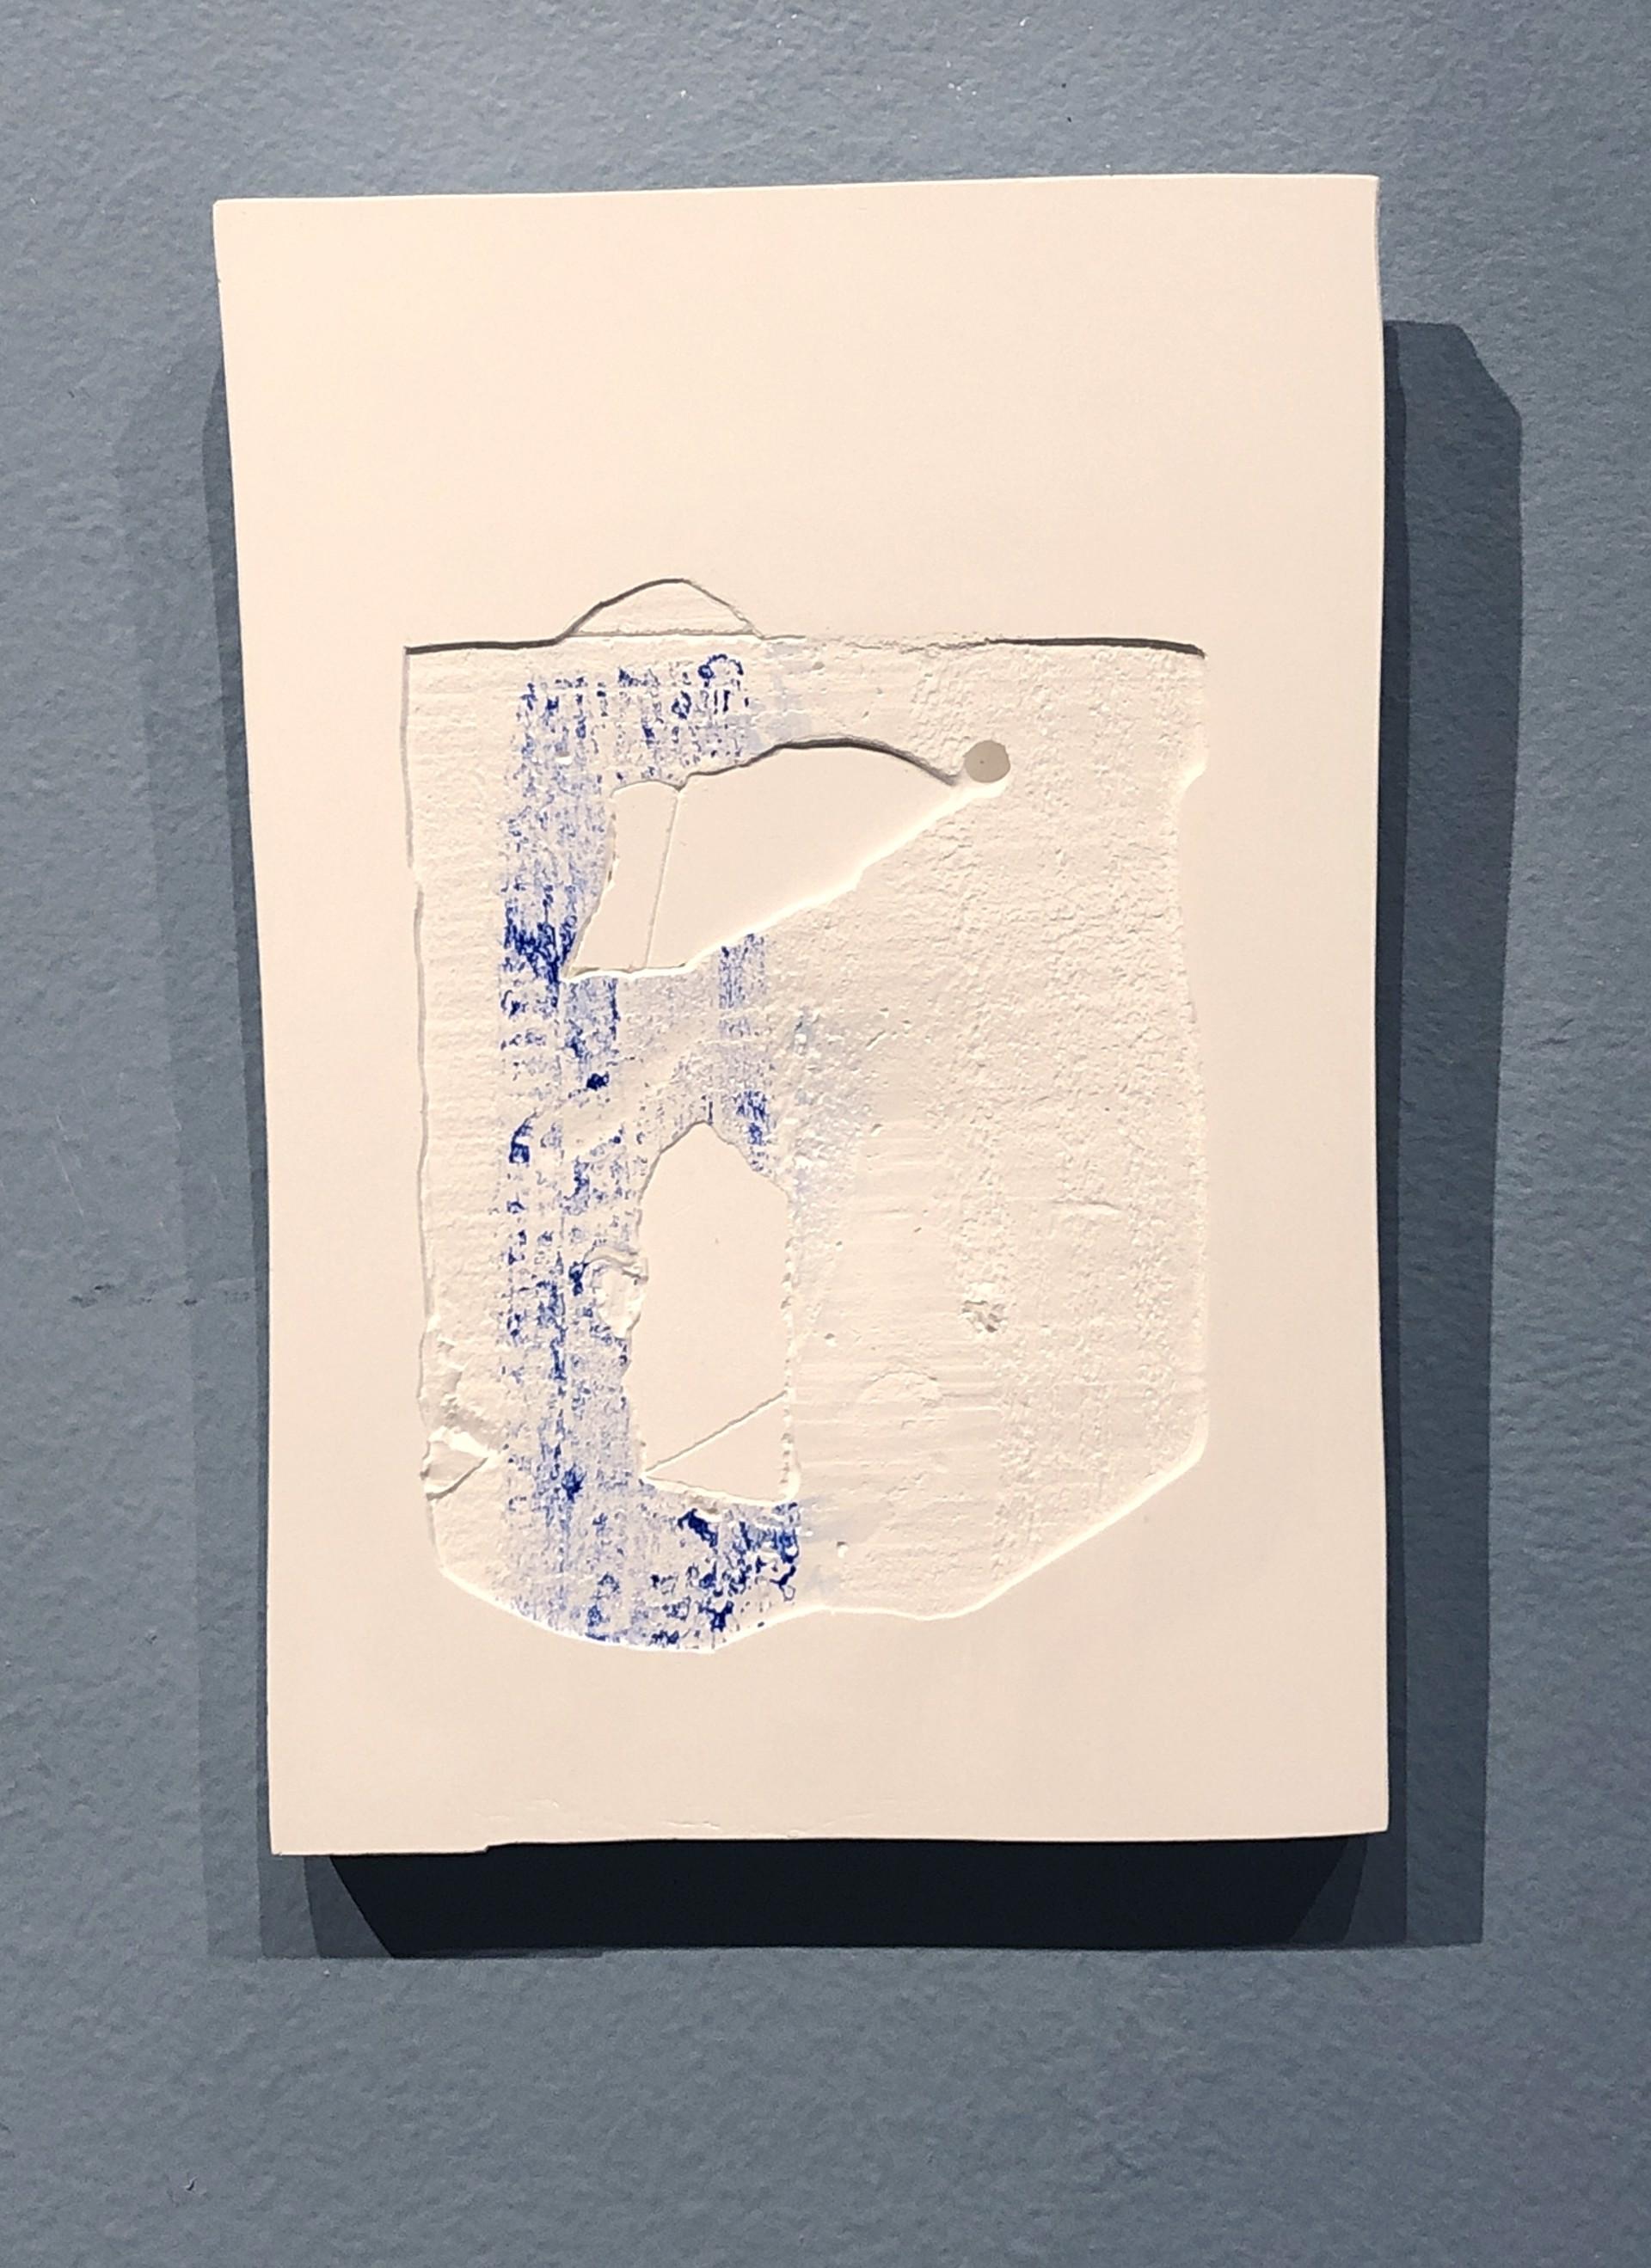 Beyond the boundary by Masako Masukata